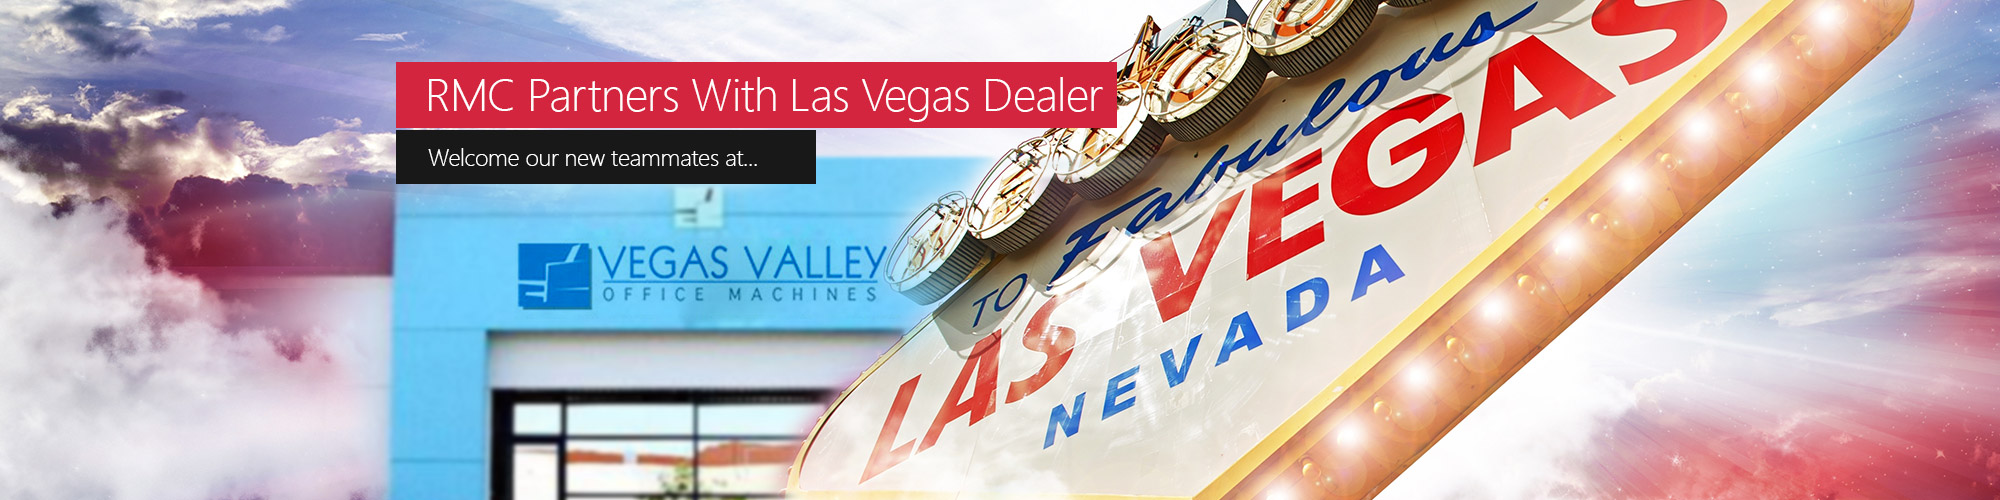 Ray Morgan Acquires Las Vegas Office Machines